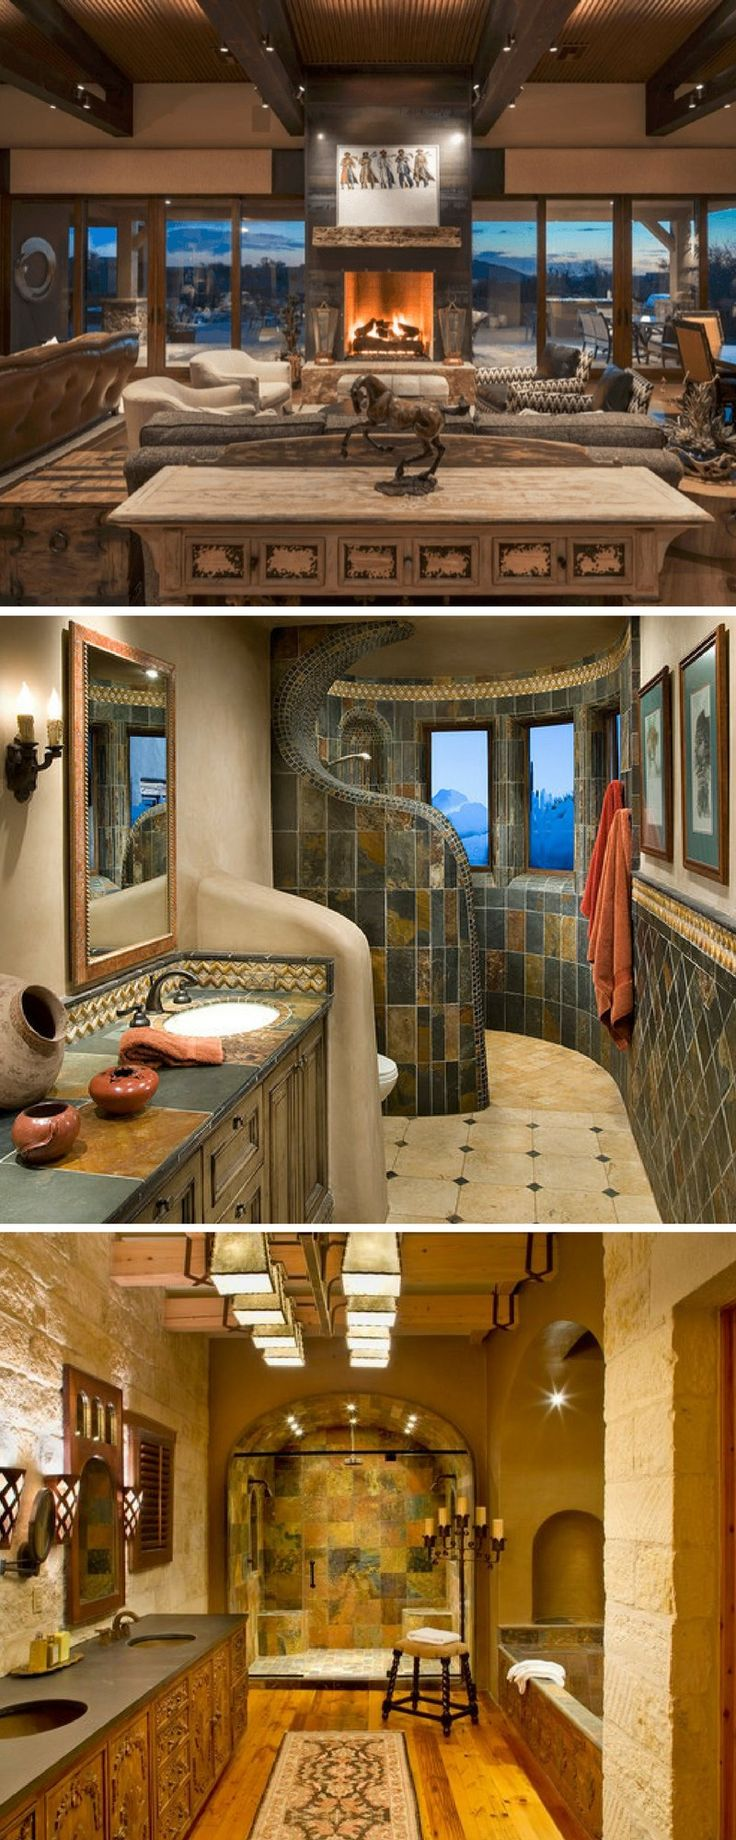 Best 25+ Southwestern home decor ideas on Pinterest | Southwestern ...